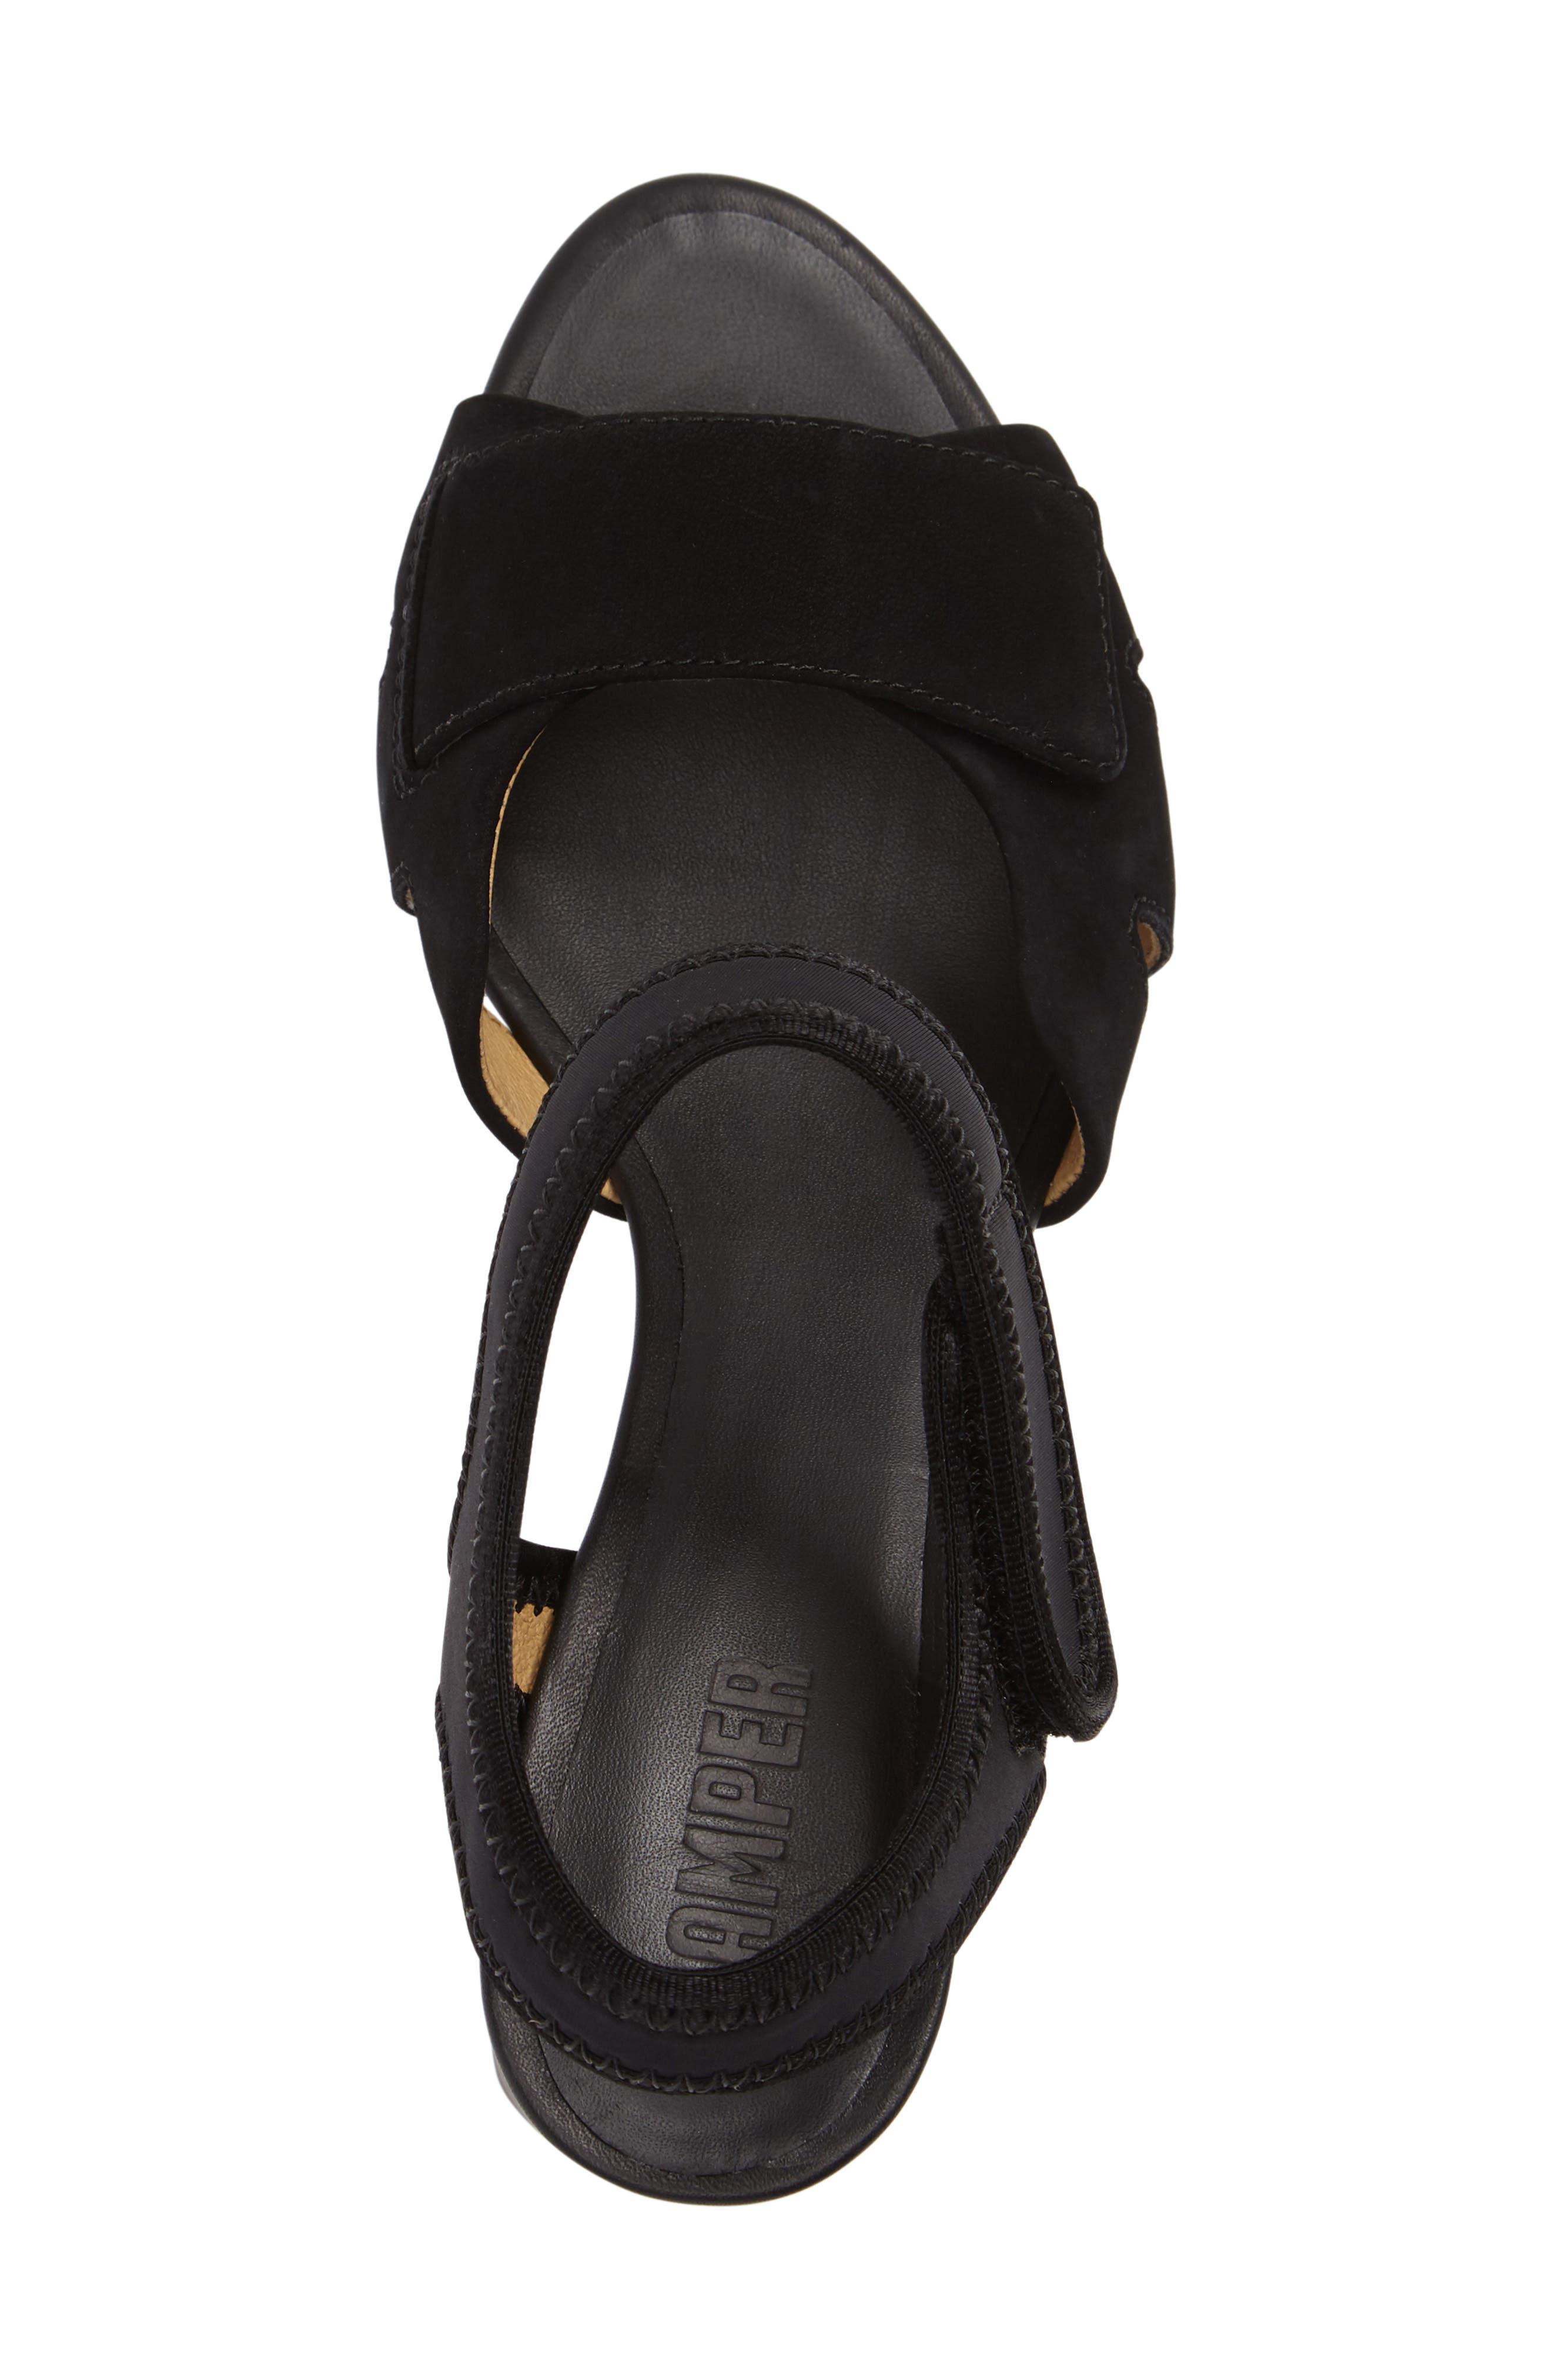 'Myriam' Ankle Strap Platform Sandal,                             Alternate thumbnail 3, color,                             Black/ Black Leather